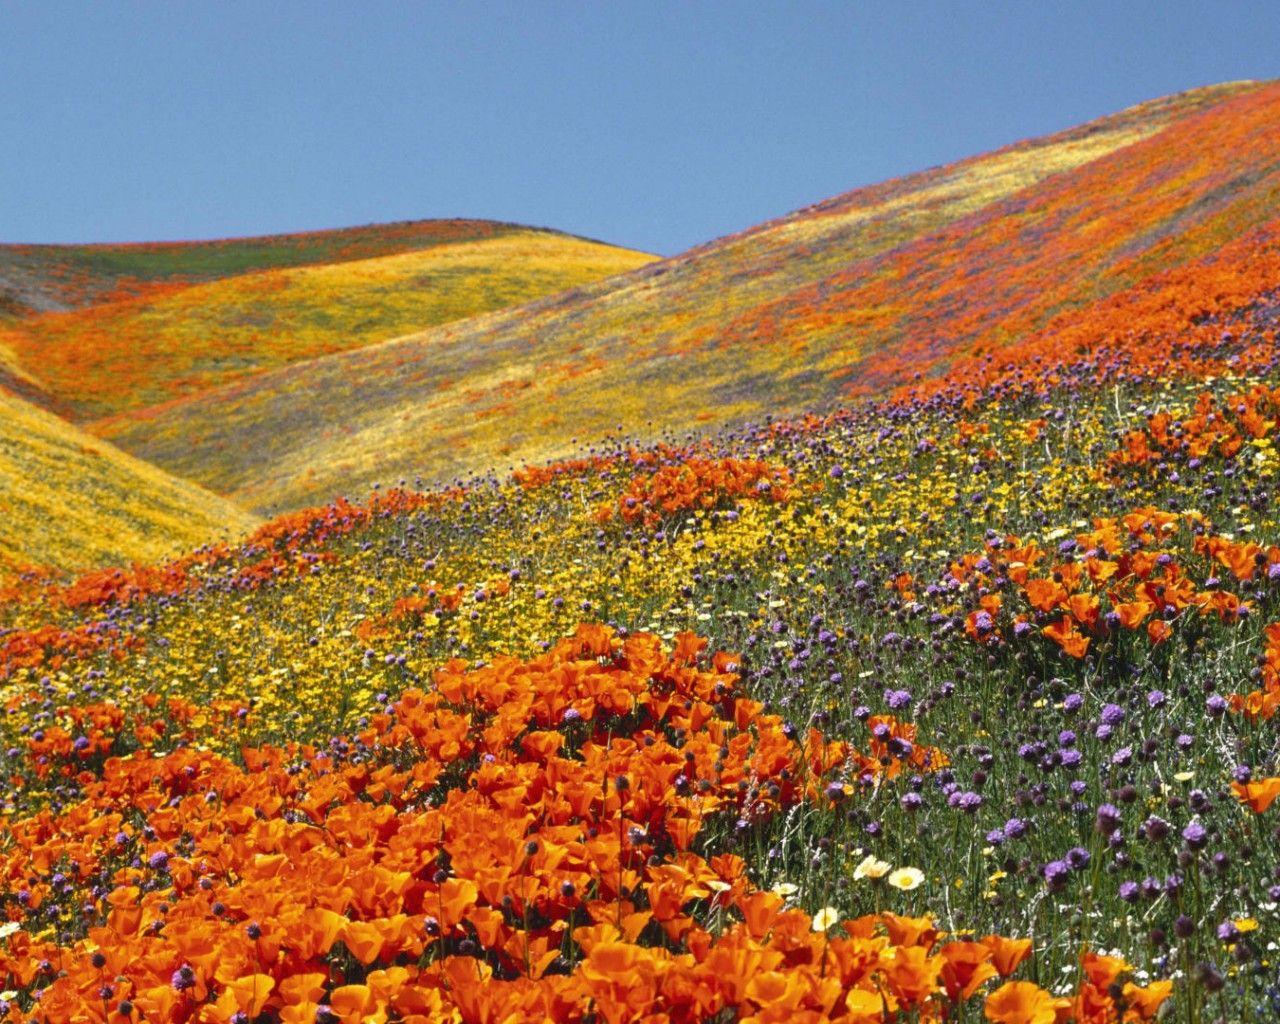 The Heavenly Fields of Antelope Valley Poppy Reserve